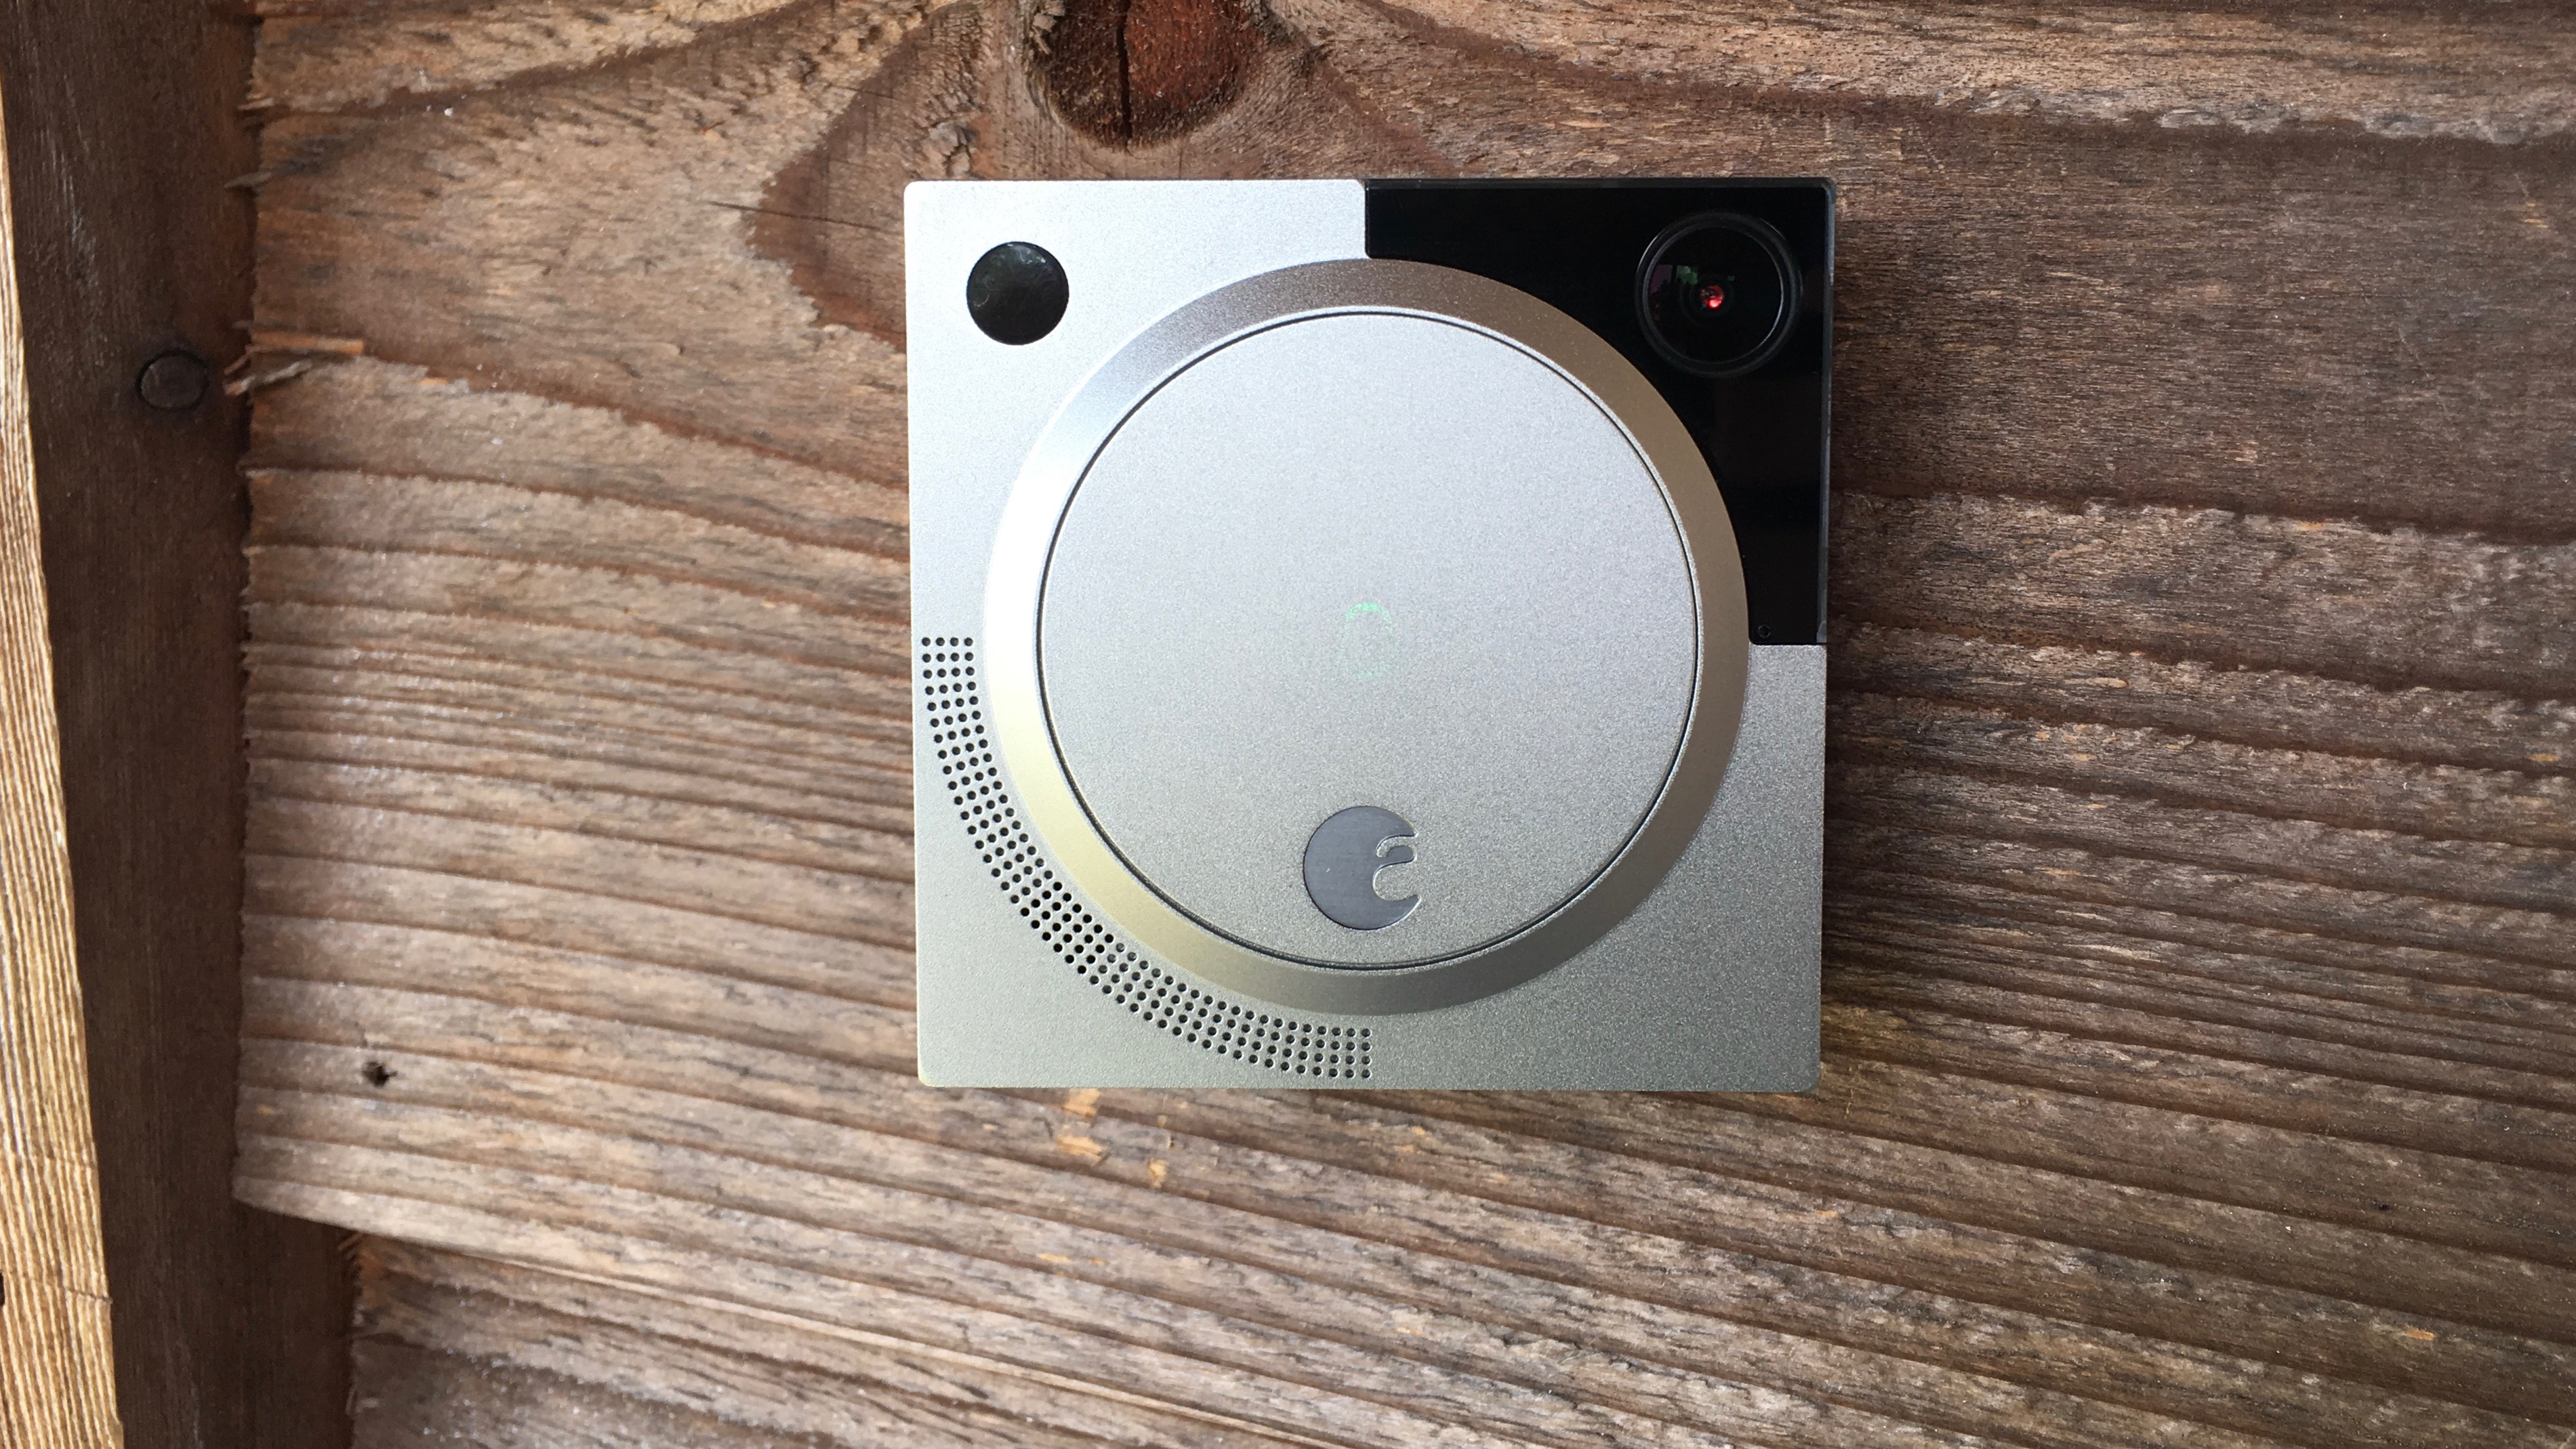 August denies doorbell camera HomeKit support despite user claim